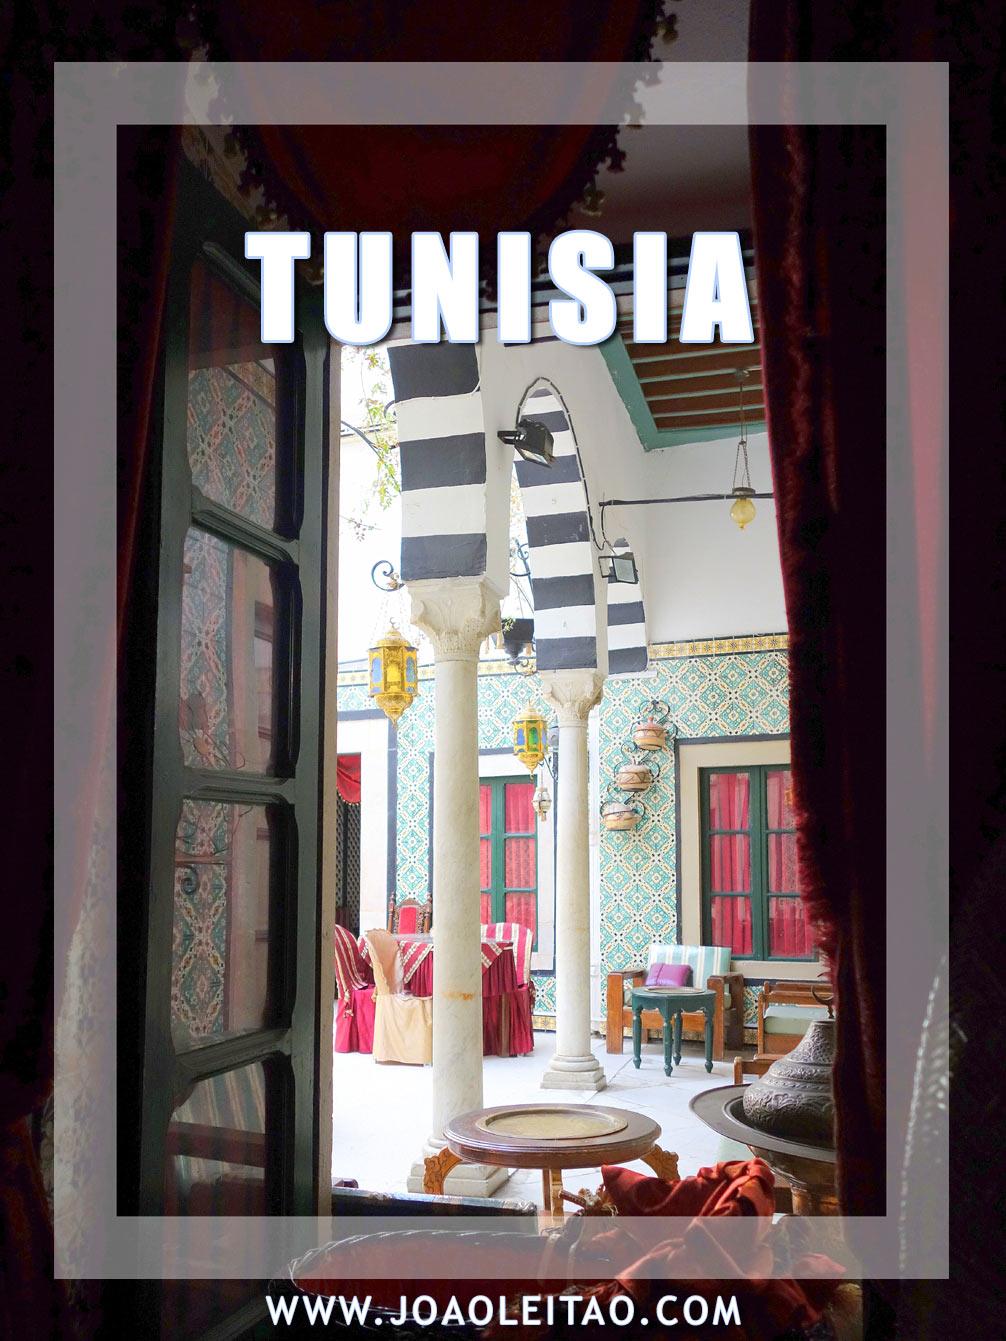 Tunisia Budget Accommodation